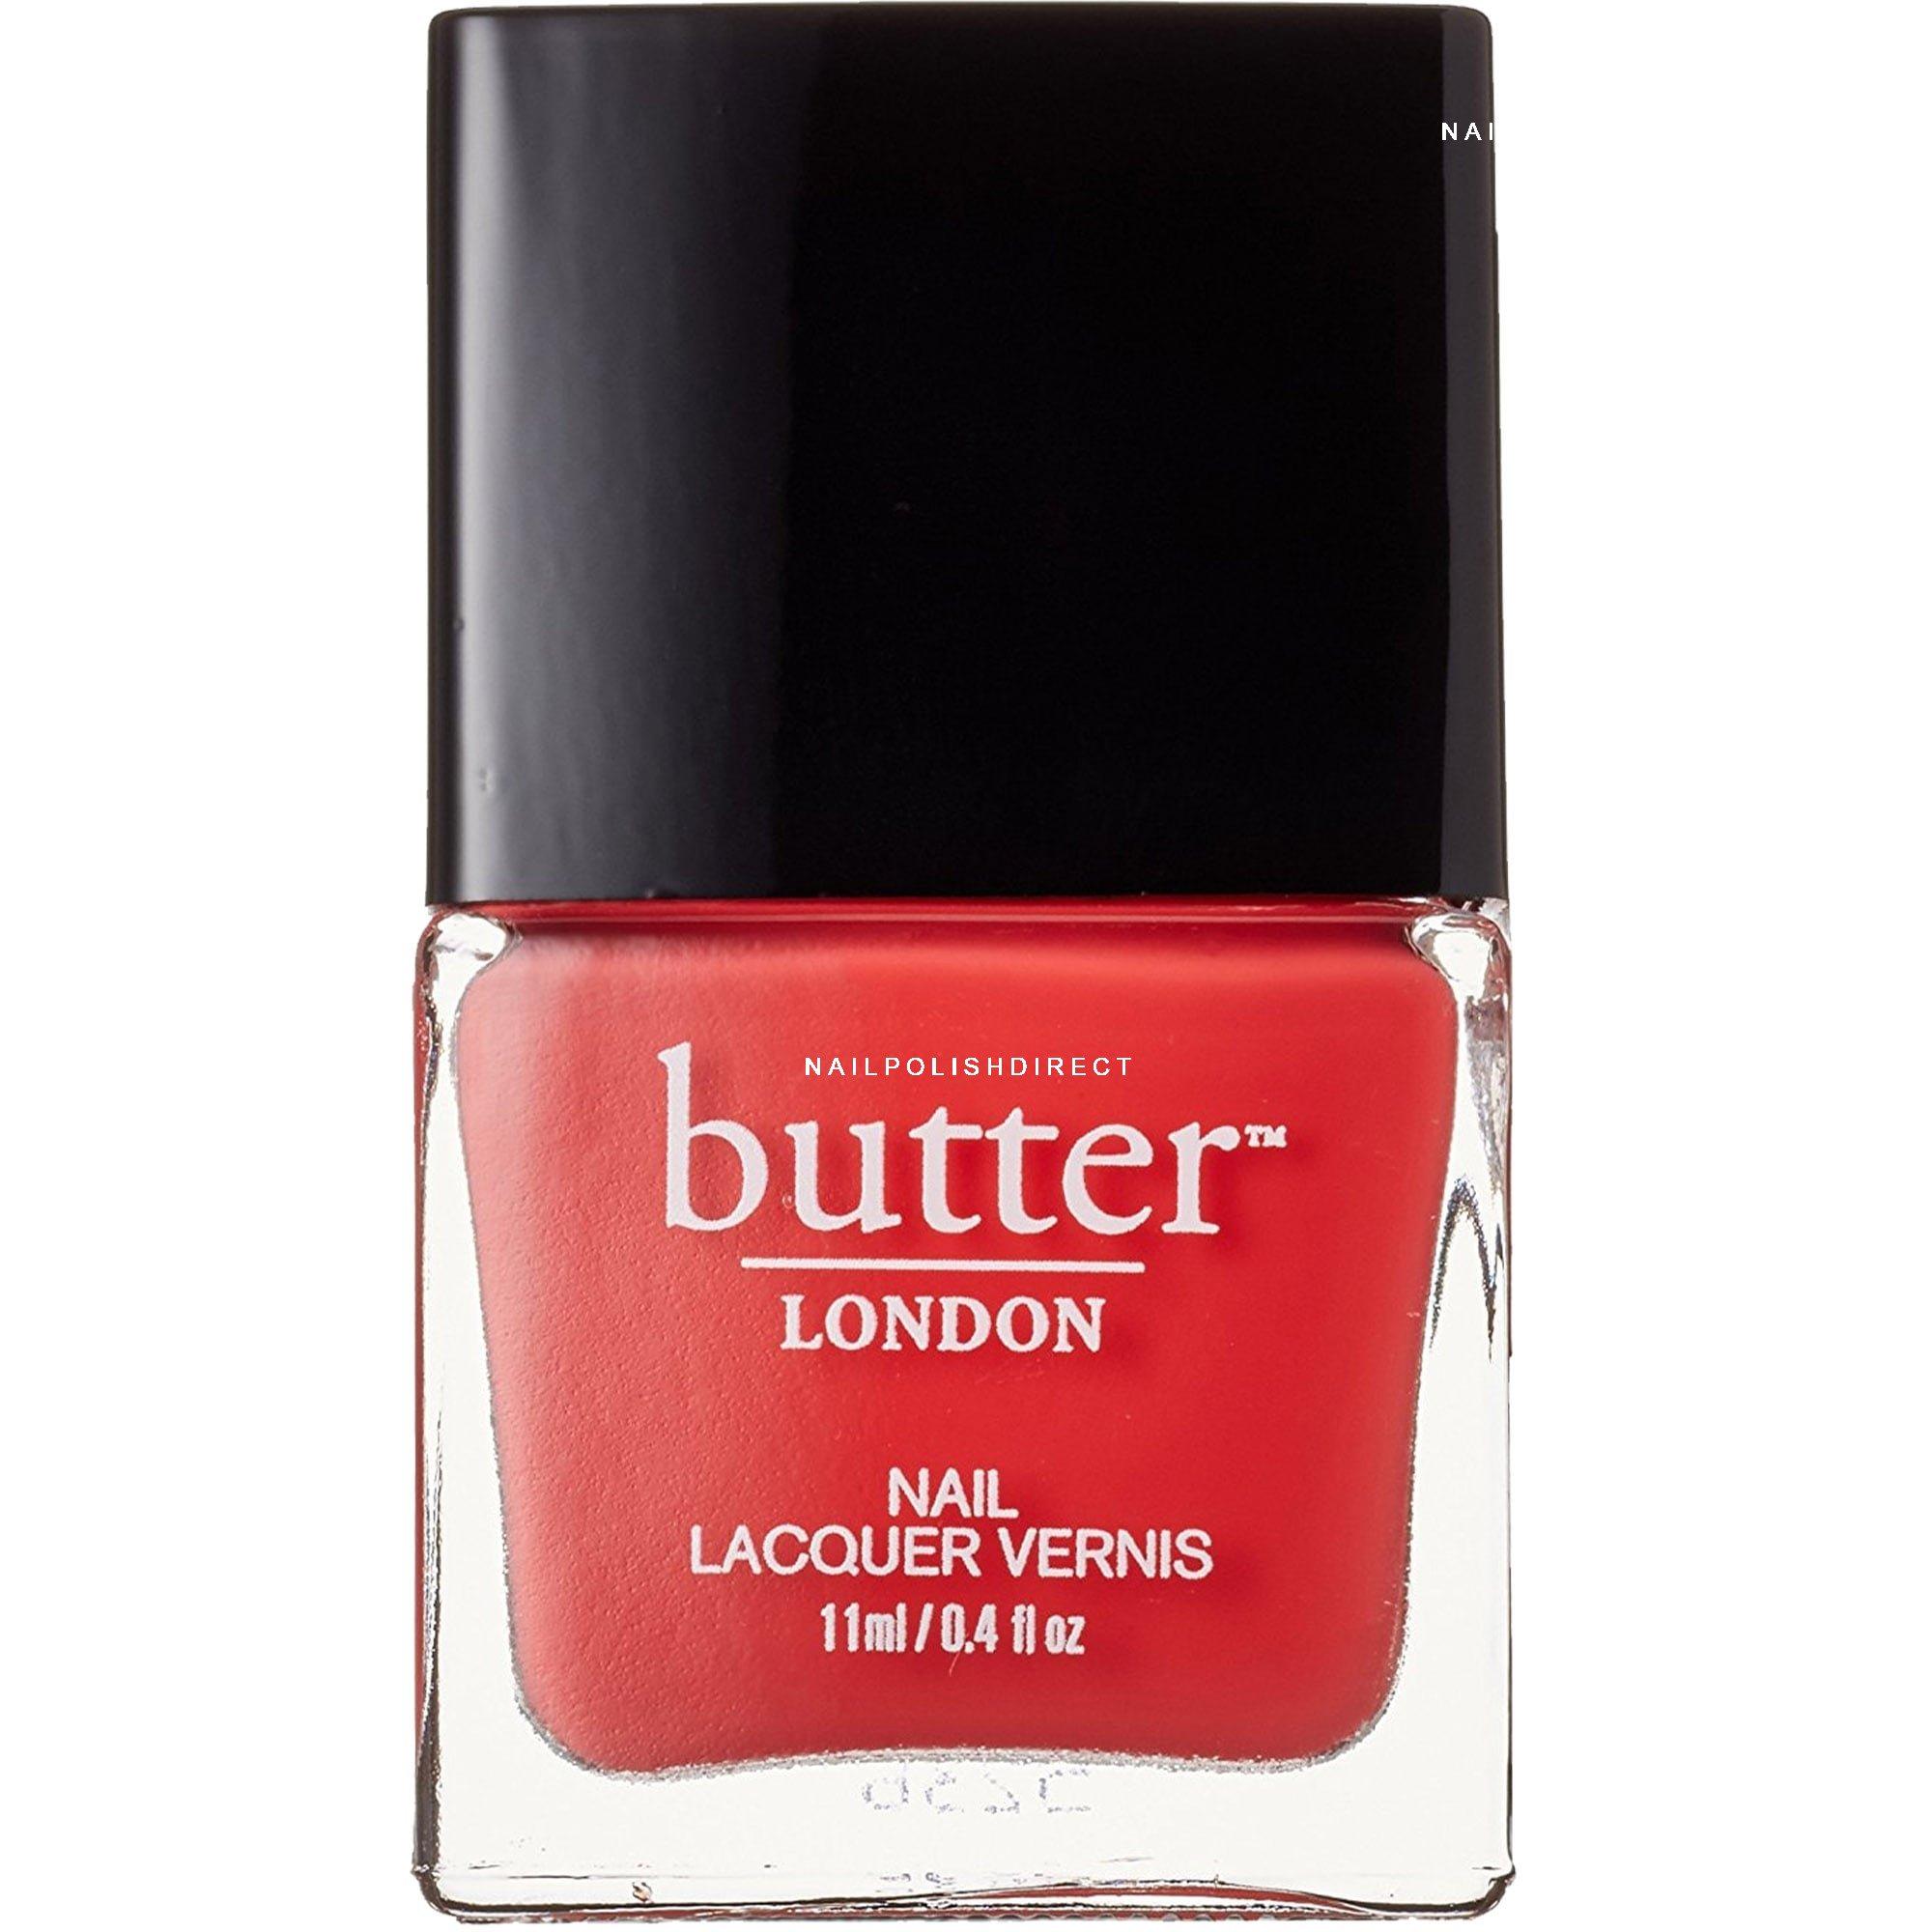 Butter London Nail Polish - Macbeth (2209) 11ml